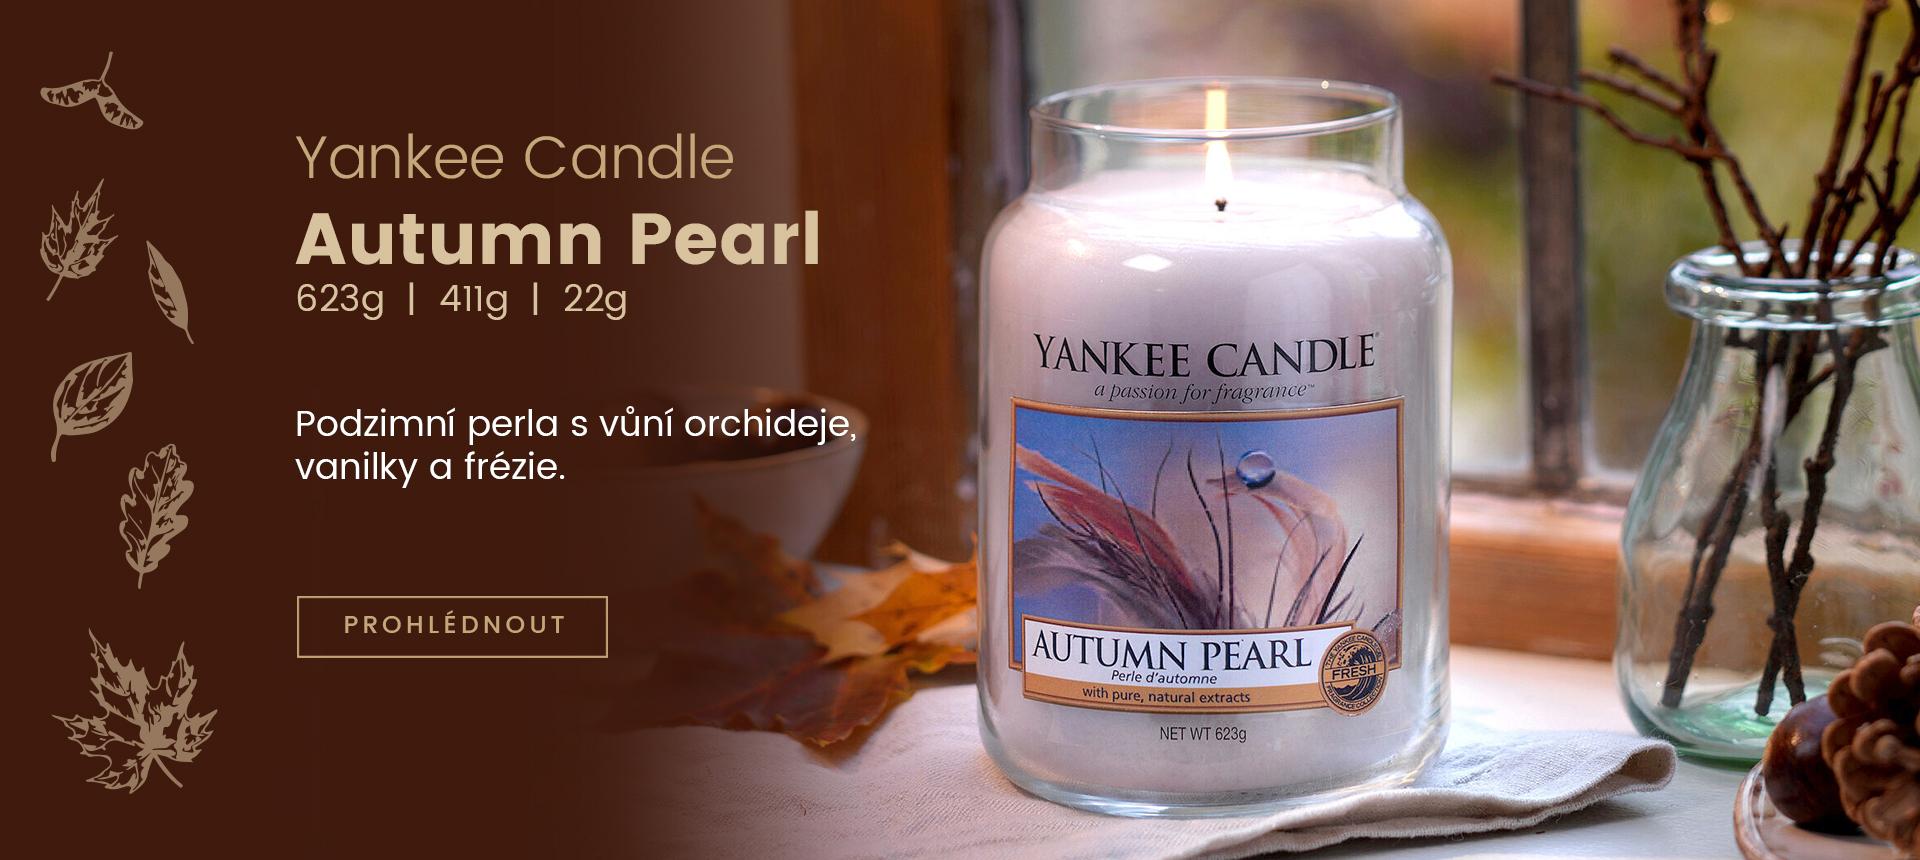 Yankee Candle Autumn Pearl